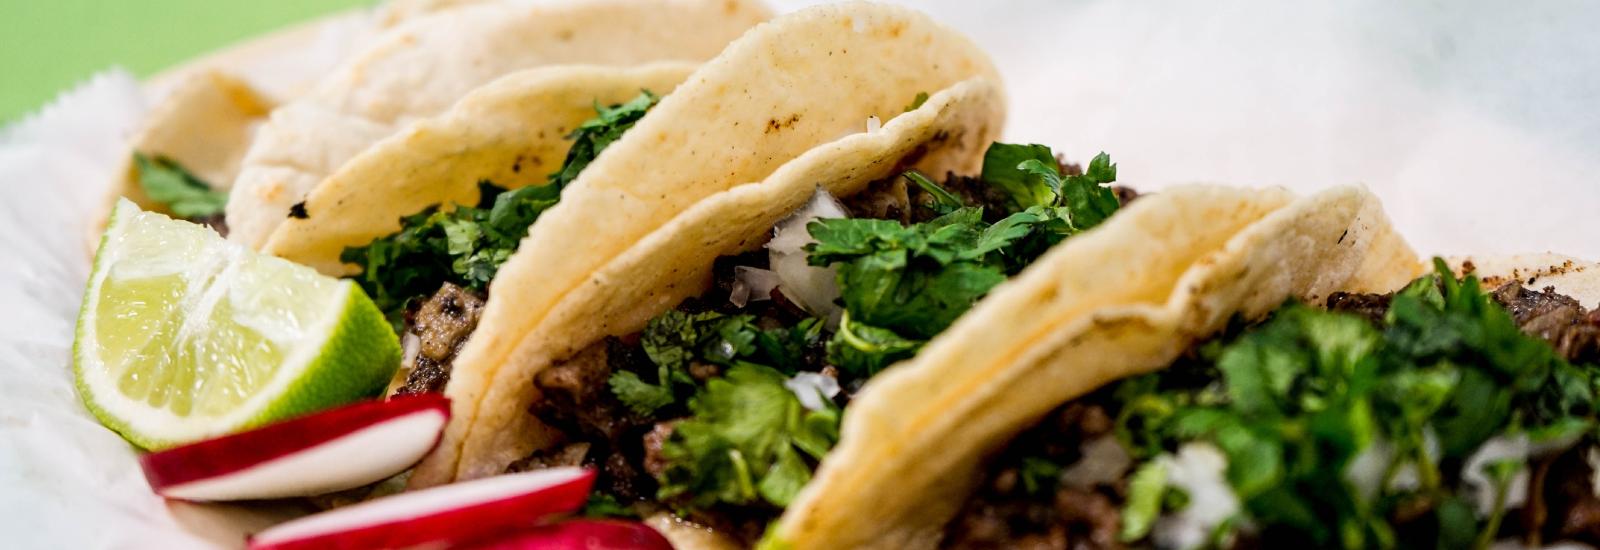 Mexican Restaurants Near Fort Leonard Wood